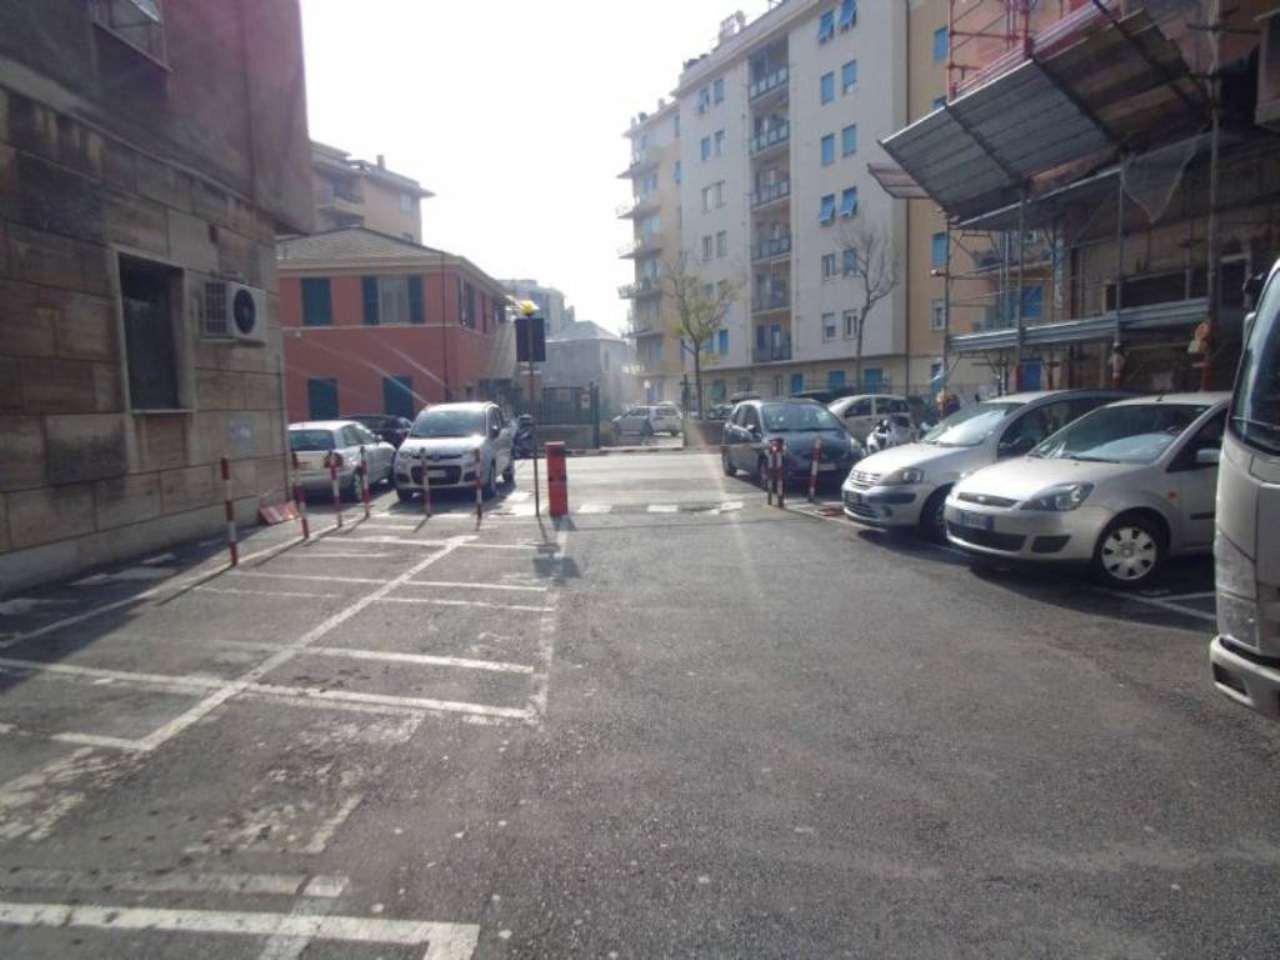 Bilocale Genova Via Bologna 7